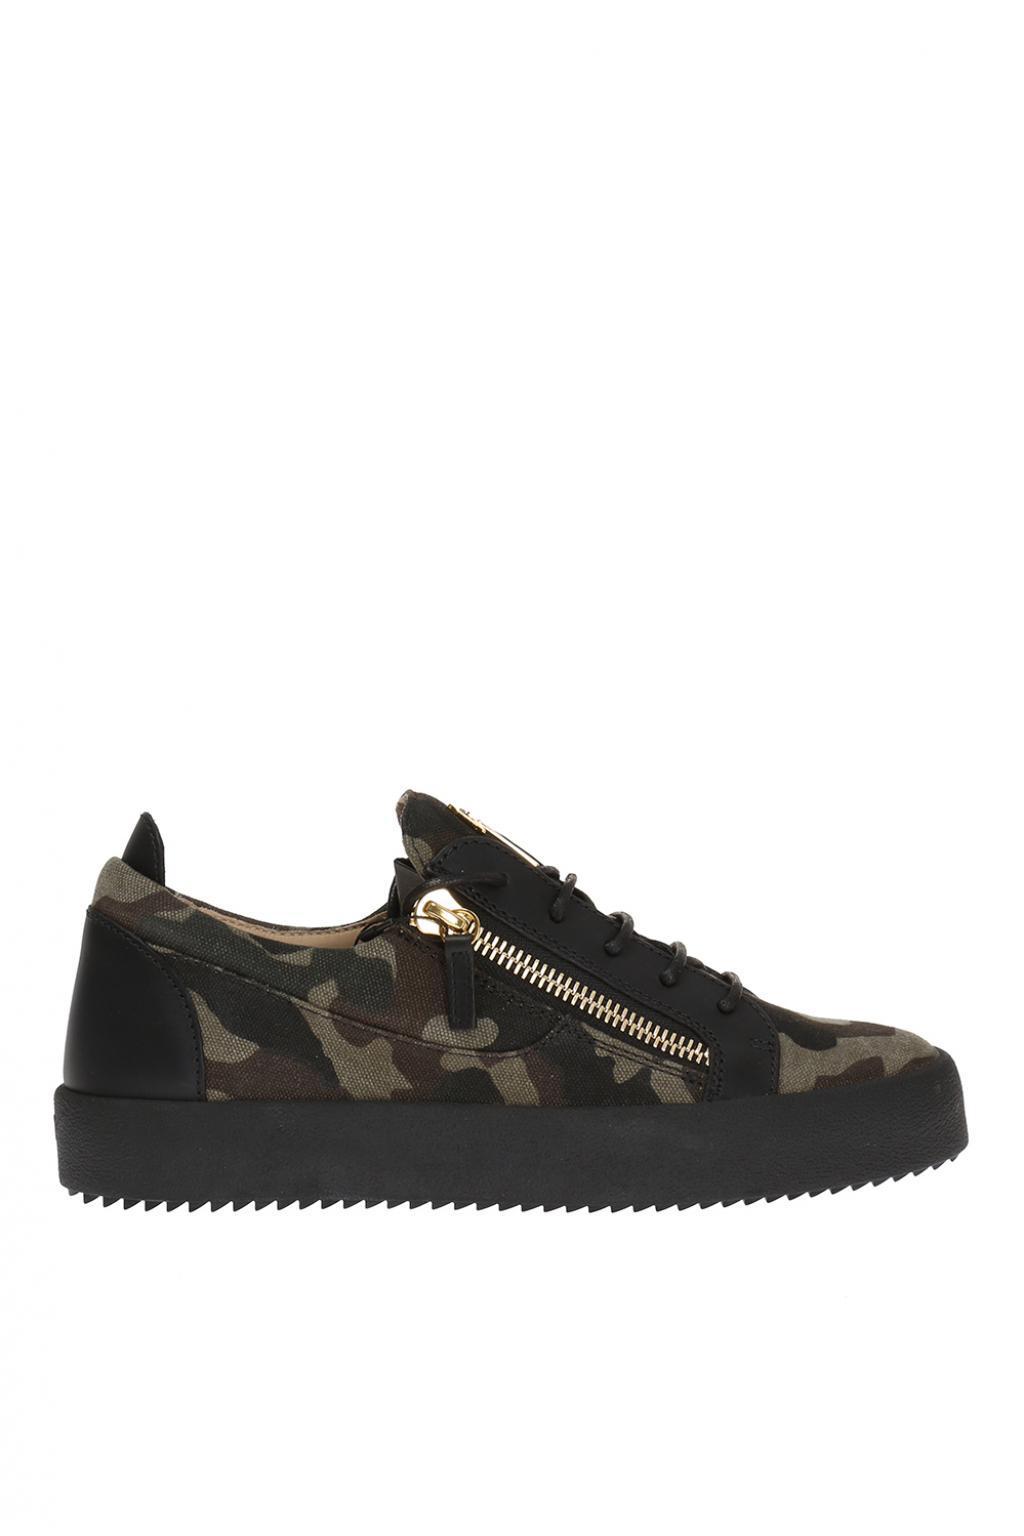 Zanotti homme sneakers pas cher